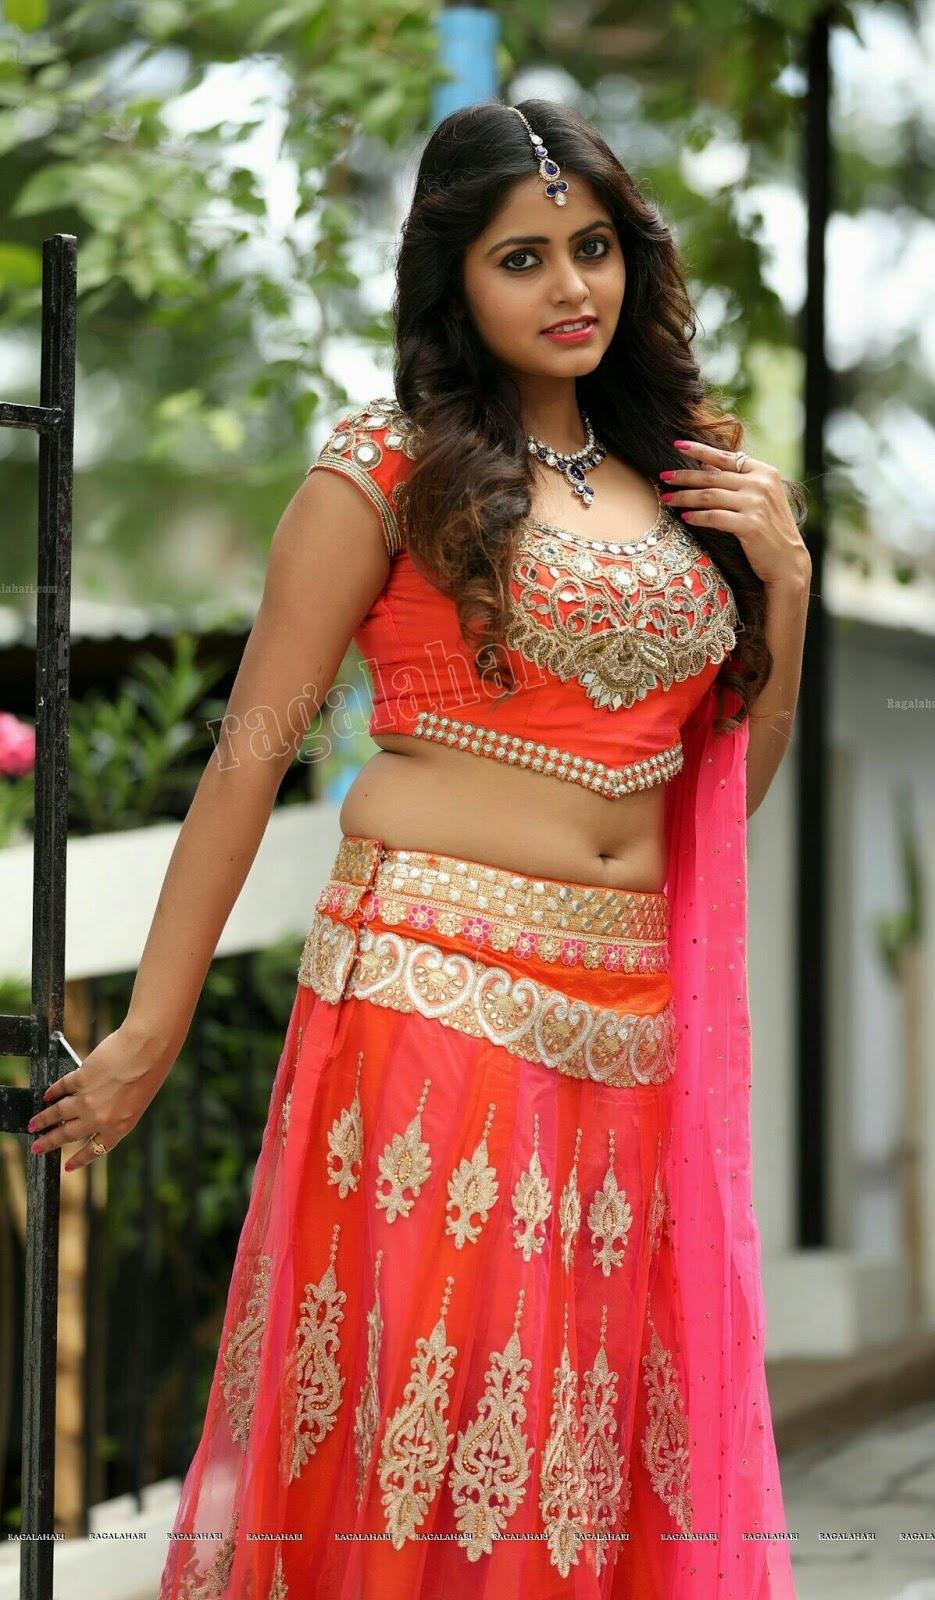 Hot Indian Model Chandrika Ravi Hot Spicy Photos 06